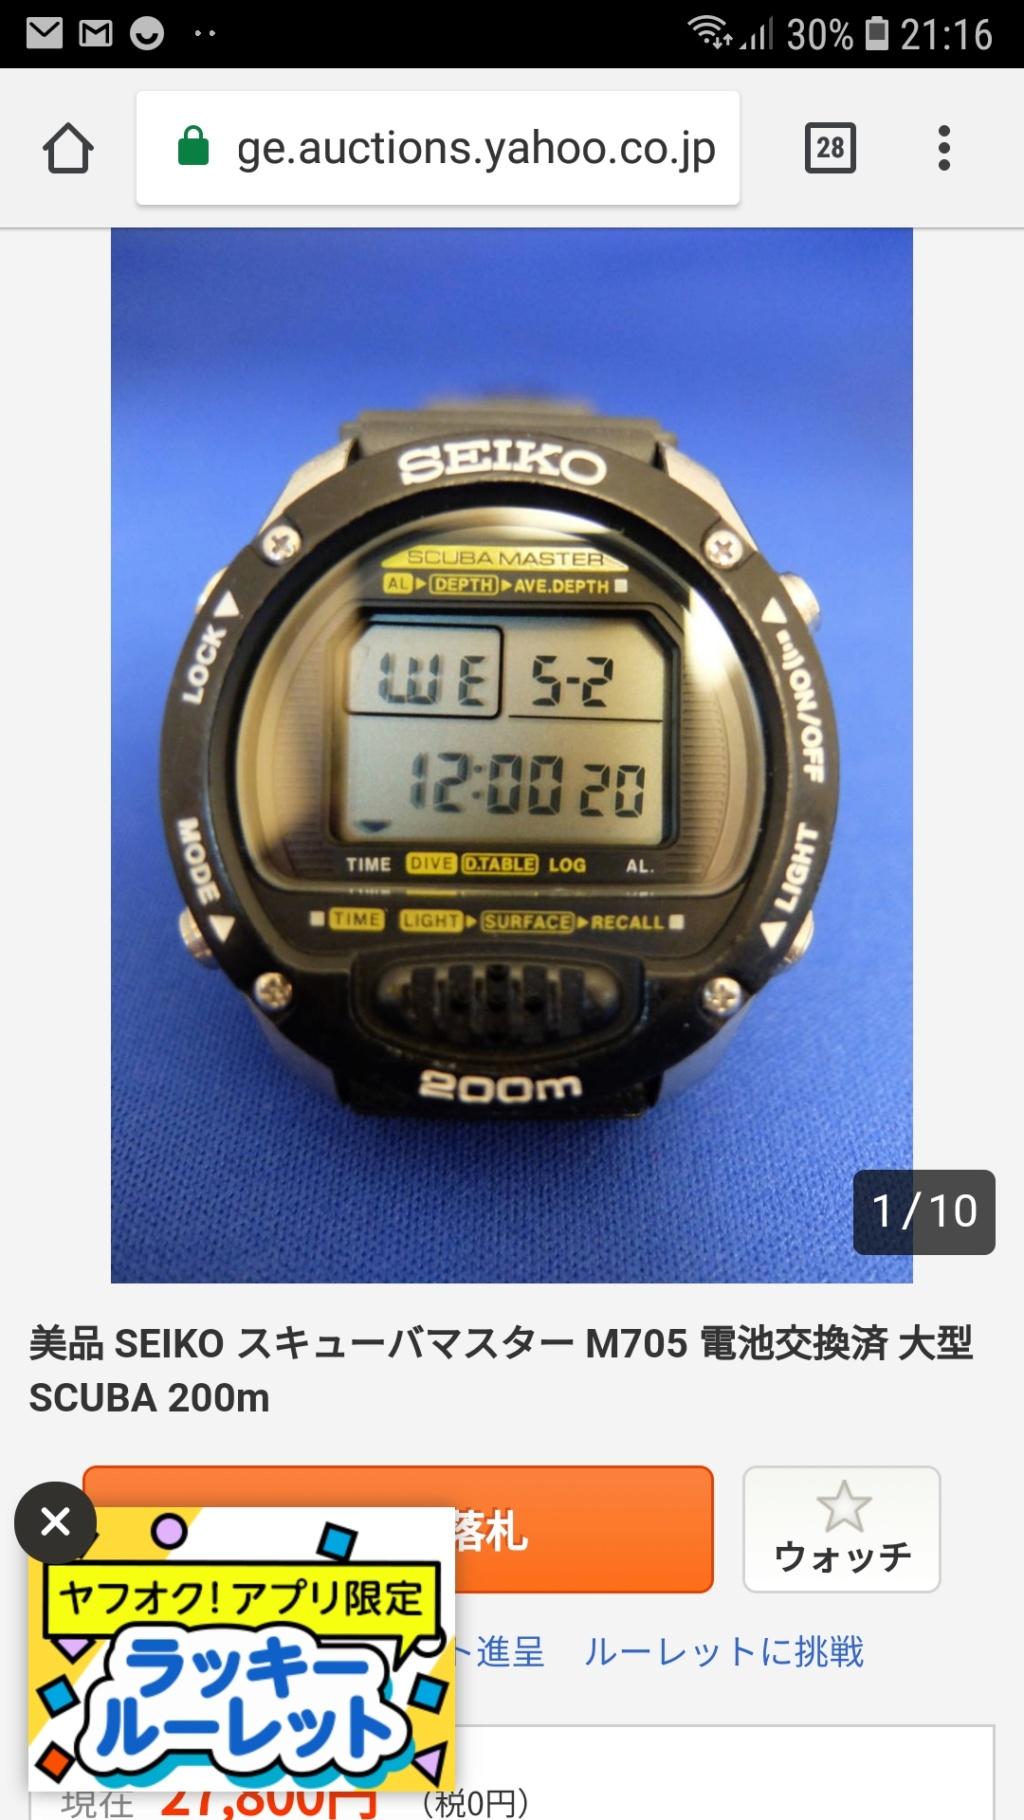 Seiko M705 vs S800 Screen10